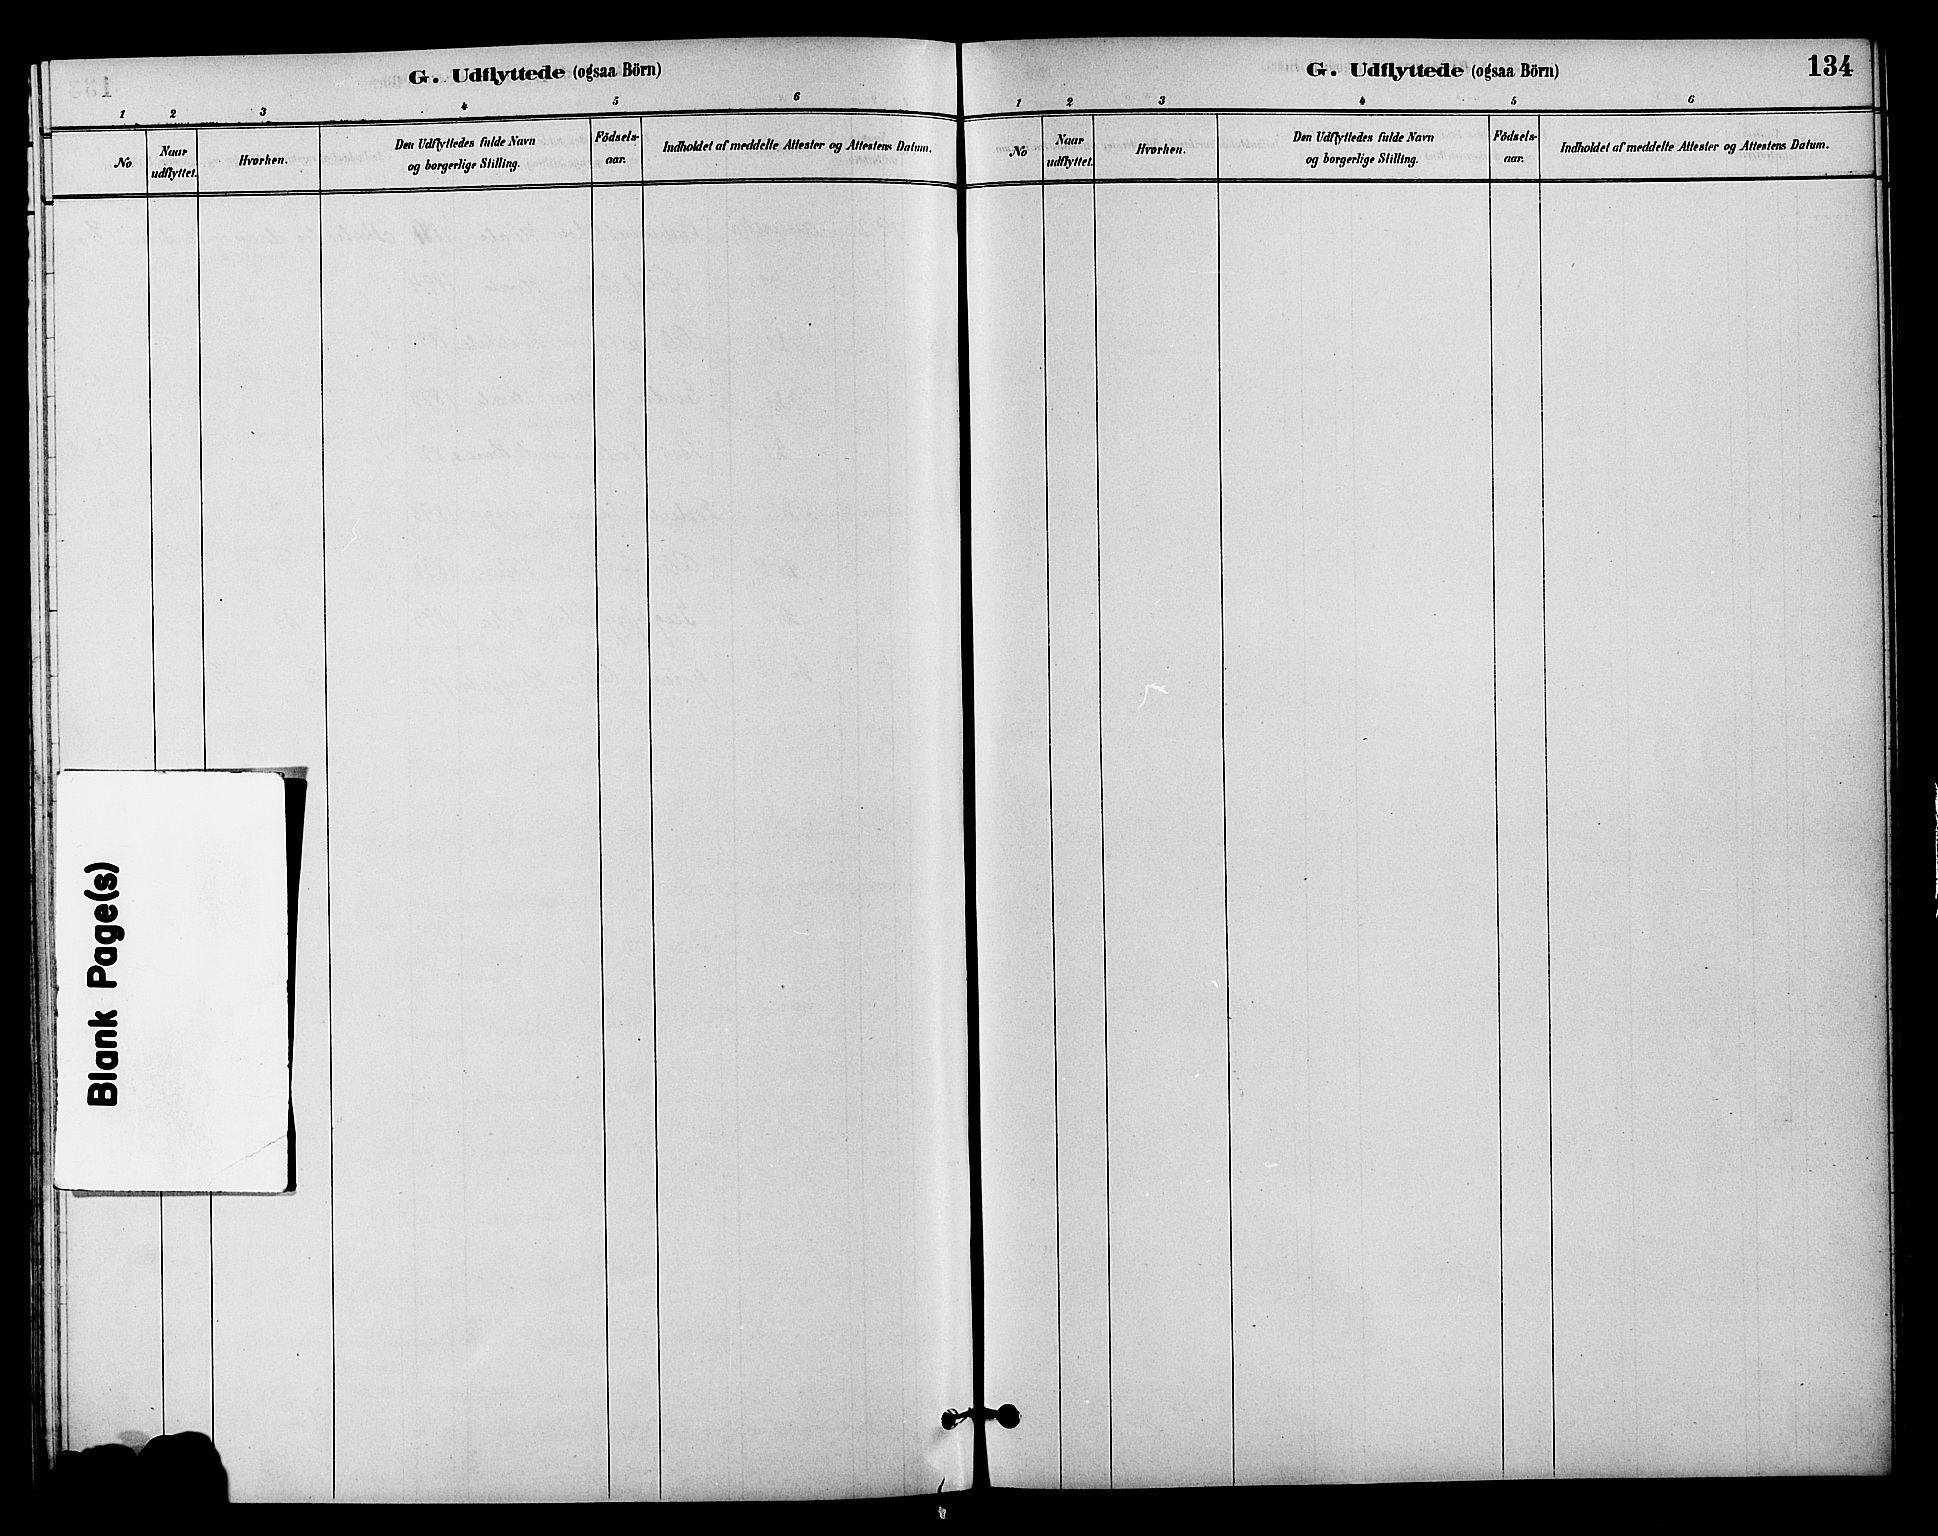 SAH, Vestre Slidre prestekontor, Klokkerbok nr. 4, 1881-1912, s. 134